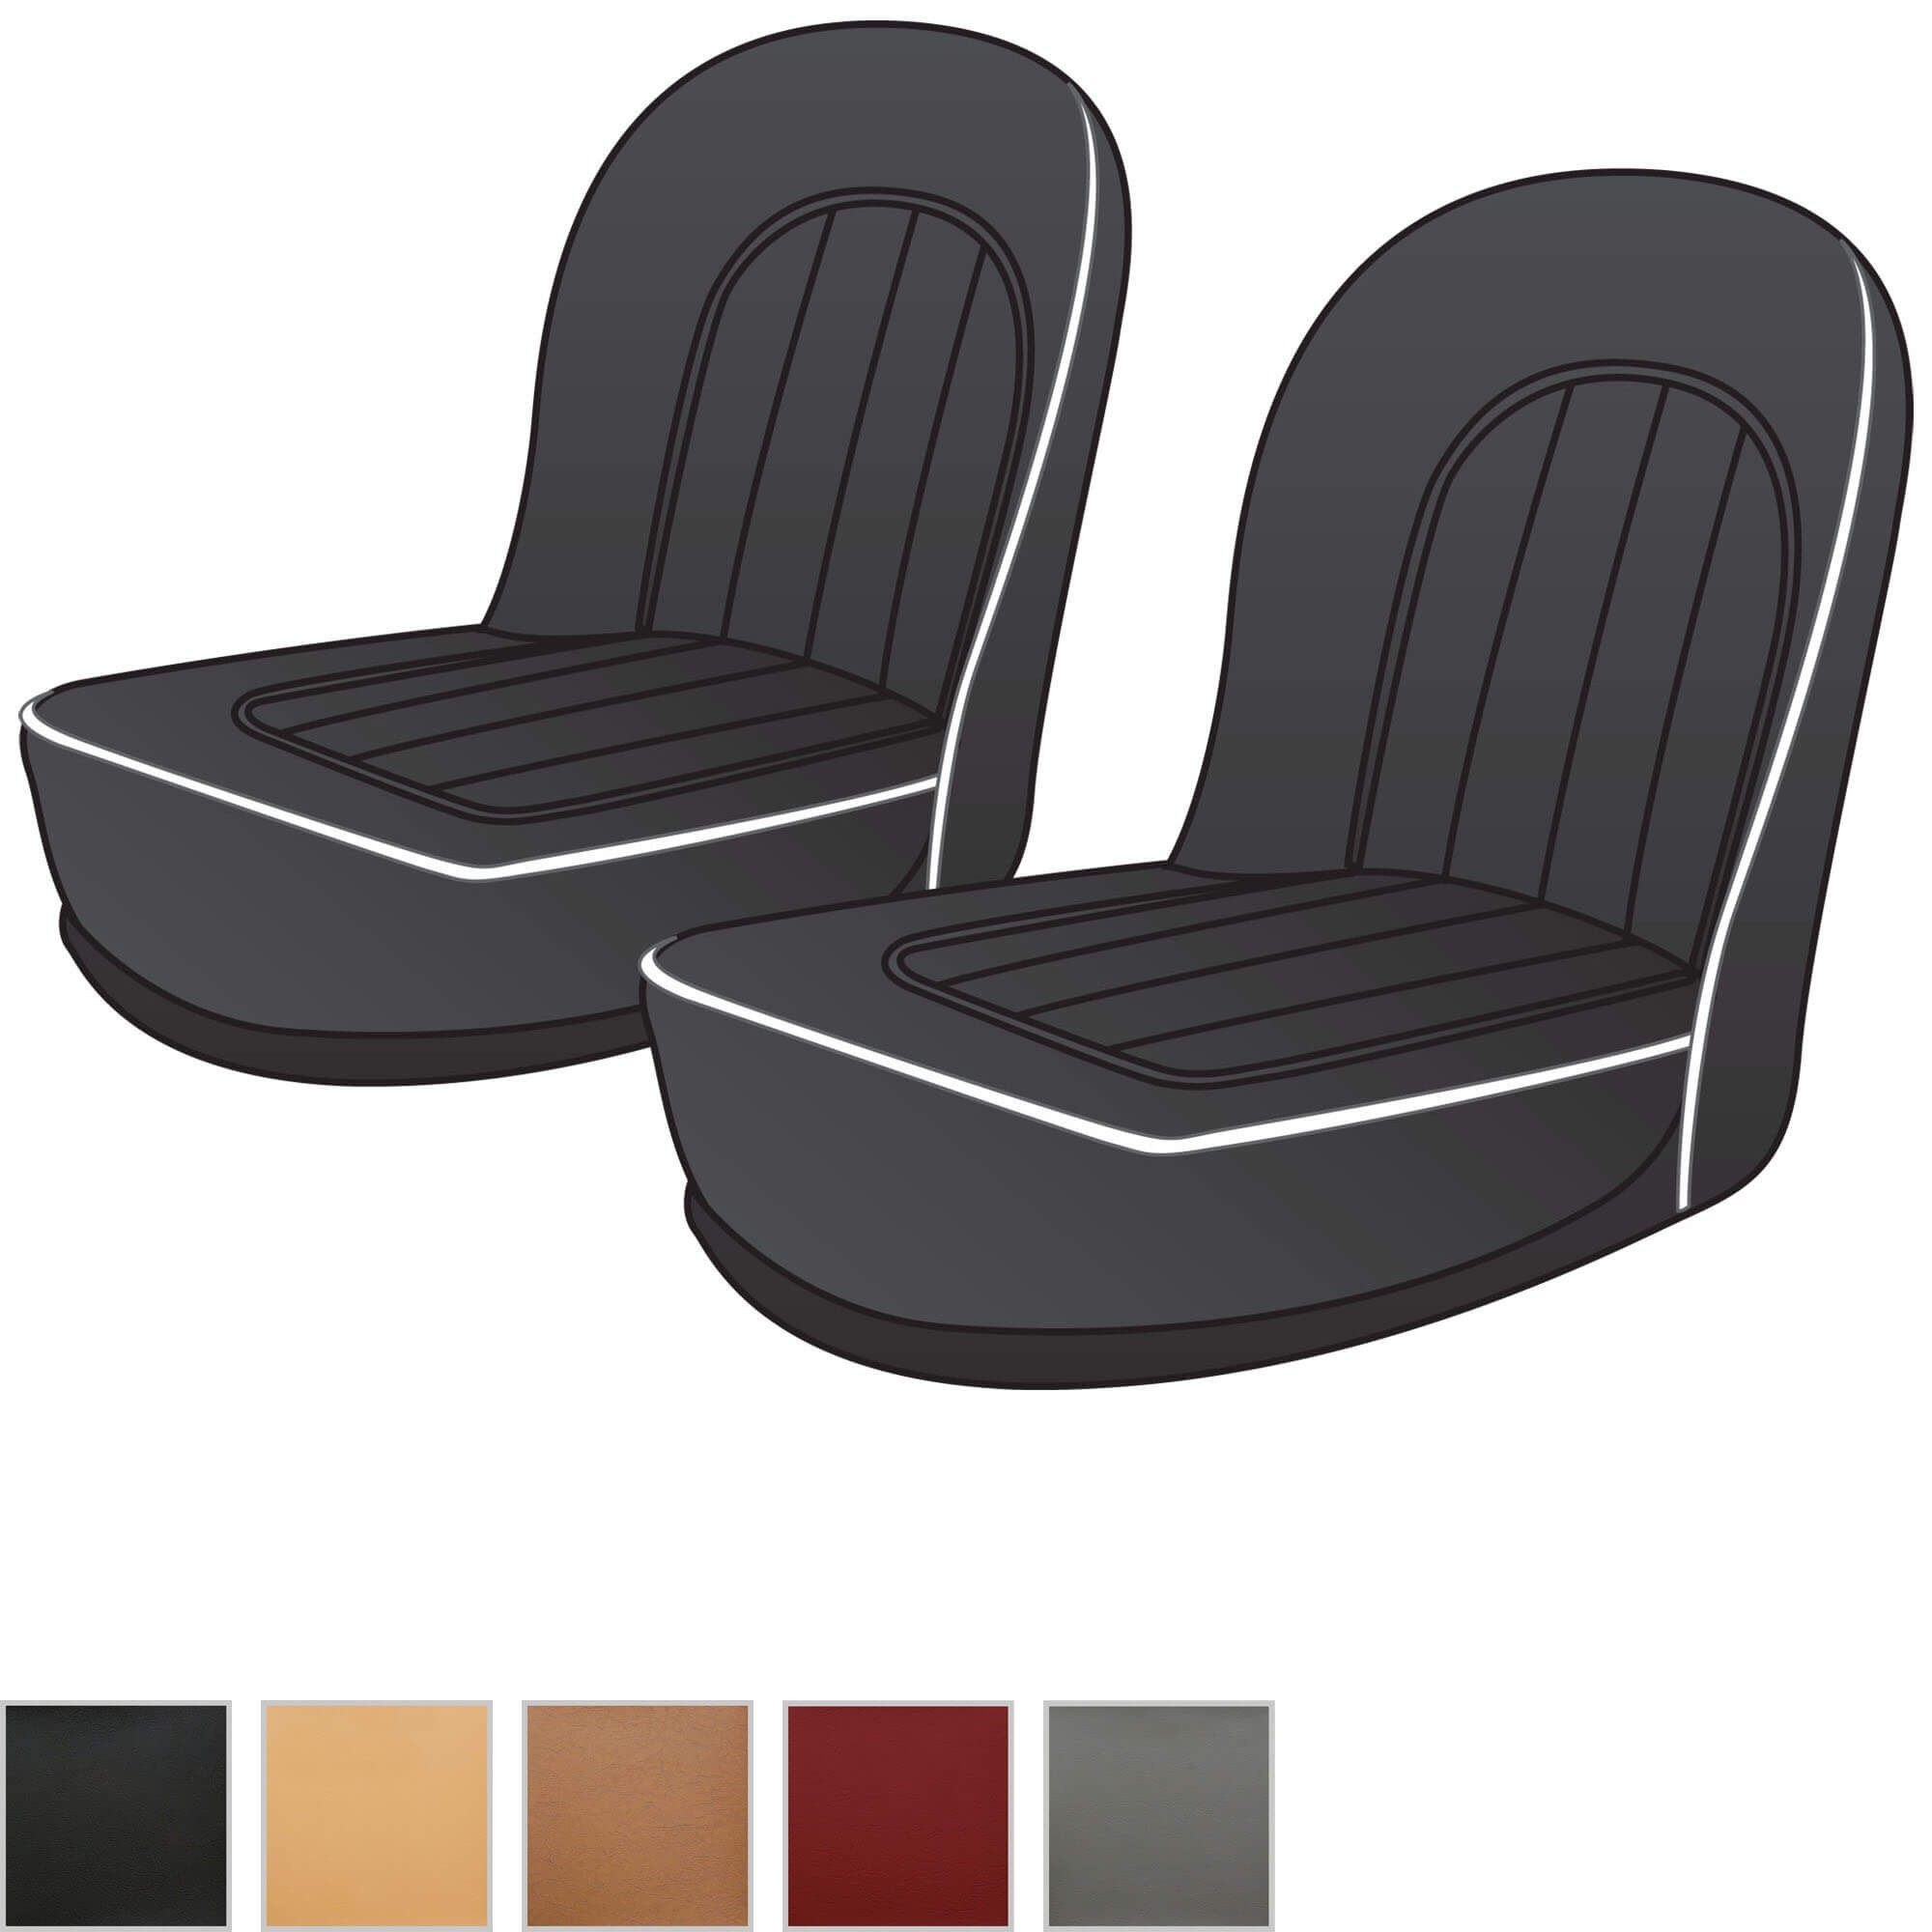 Front Seat Kits Seats Seat Kits Upholstery Interior Trim